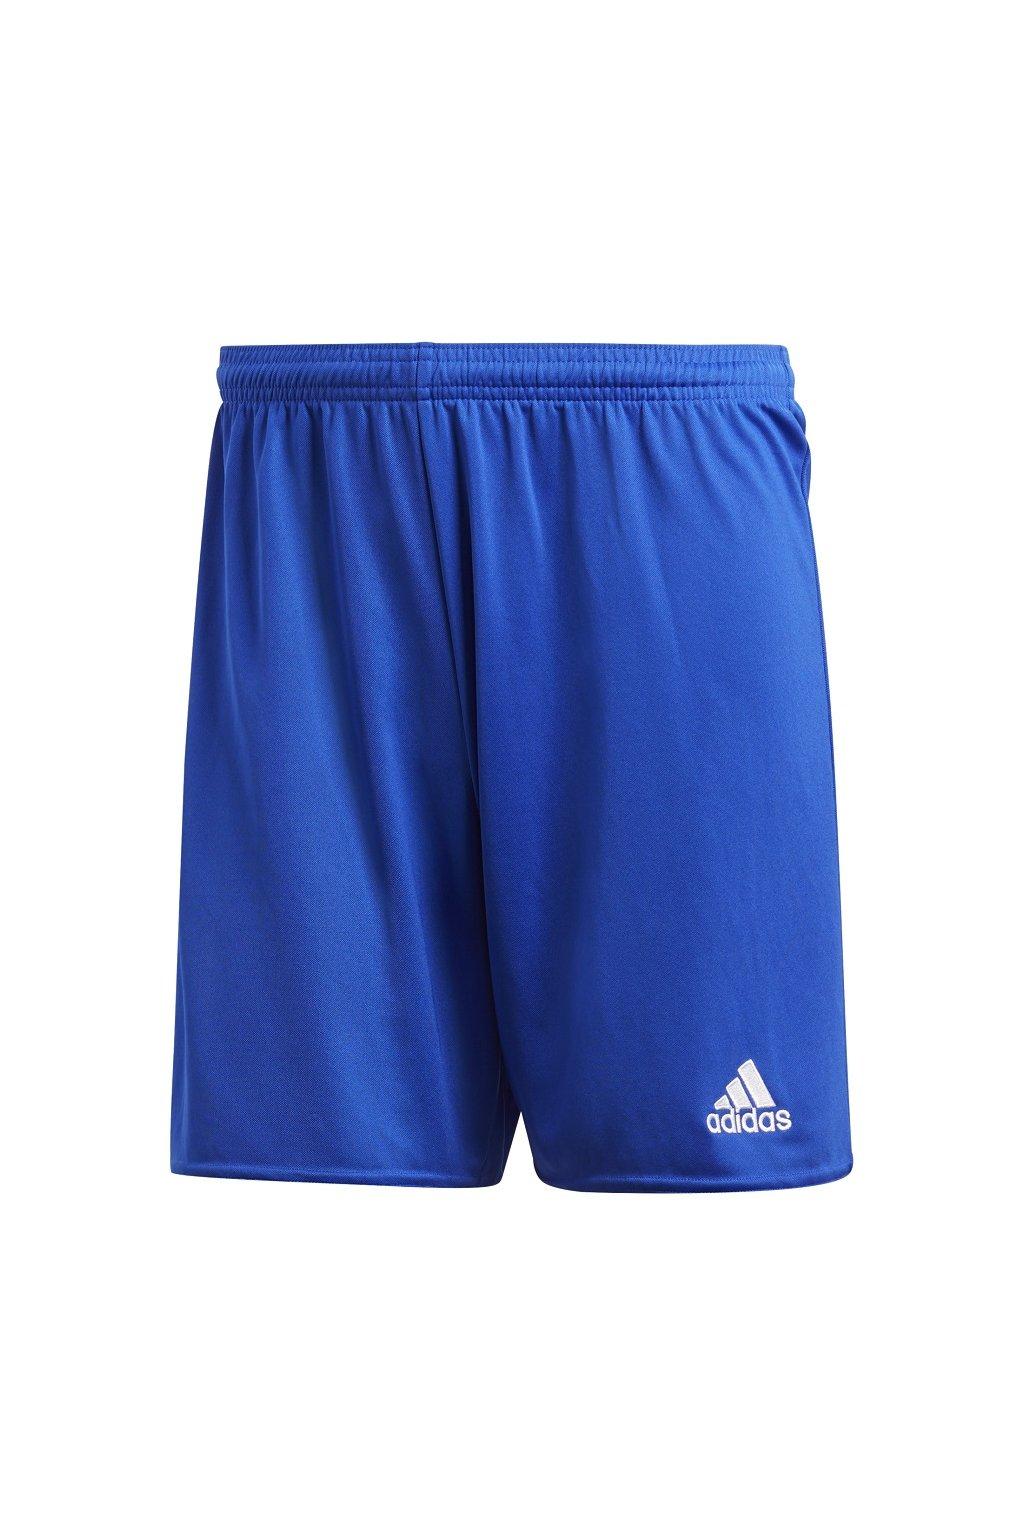 Detské kraťasy Adidas Parma 16 JUNIOR modré AJ5882